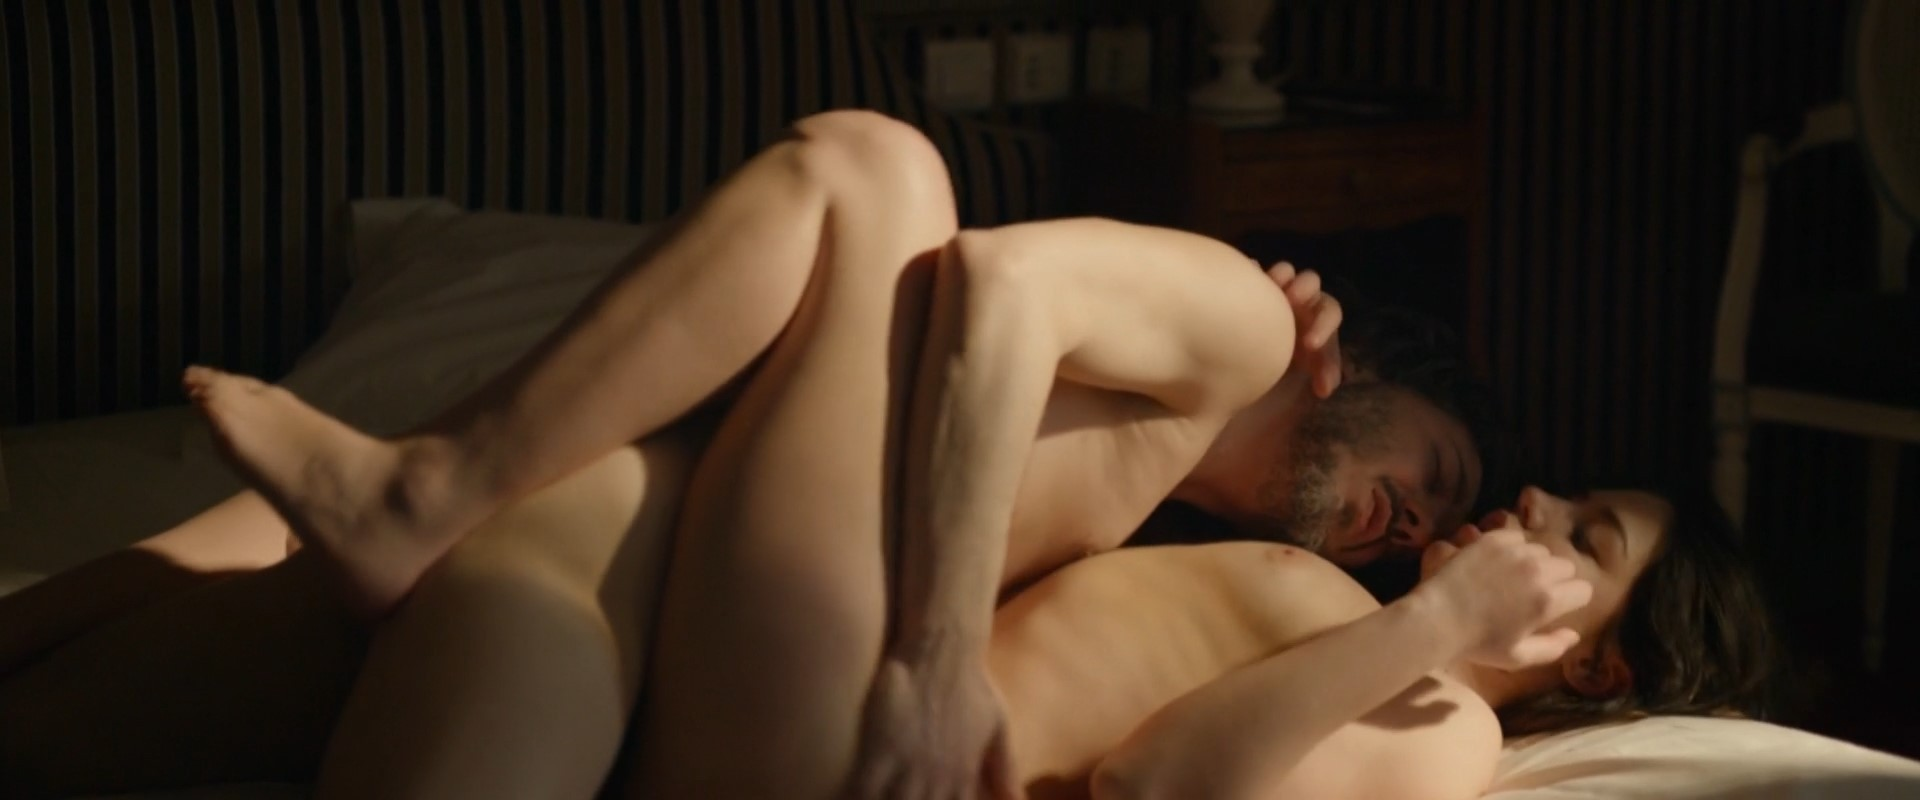 Adele Exarchopoulos porno famosas desnudas